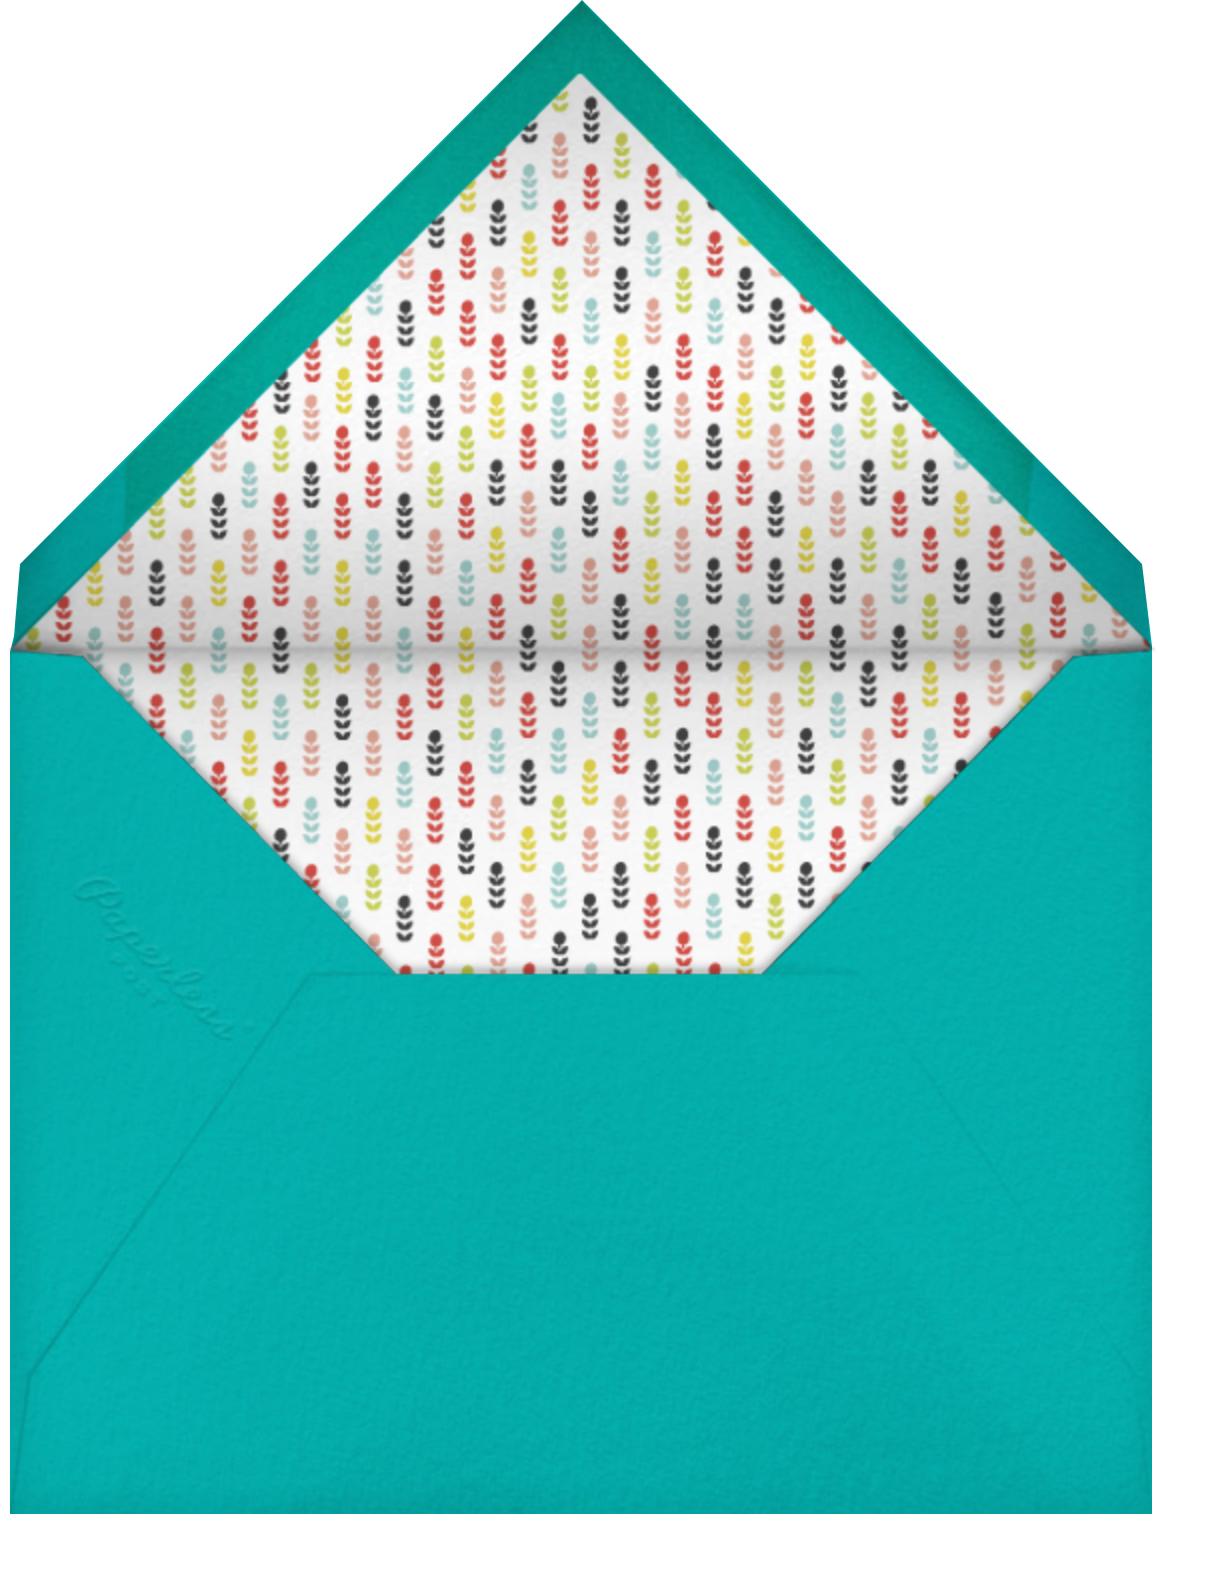 Tromping through a Meadow - Mr. Boddington's Studio - Baby shower - envelope back